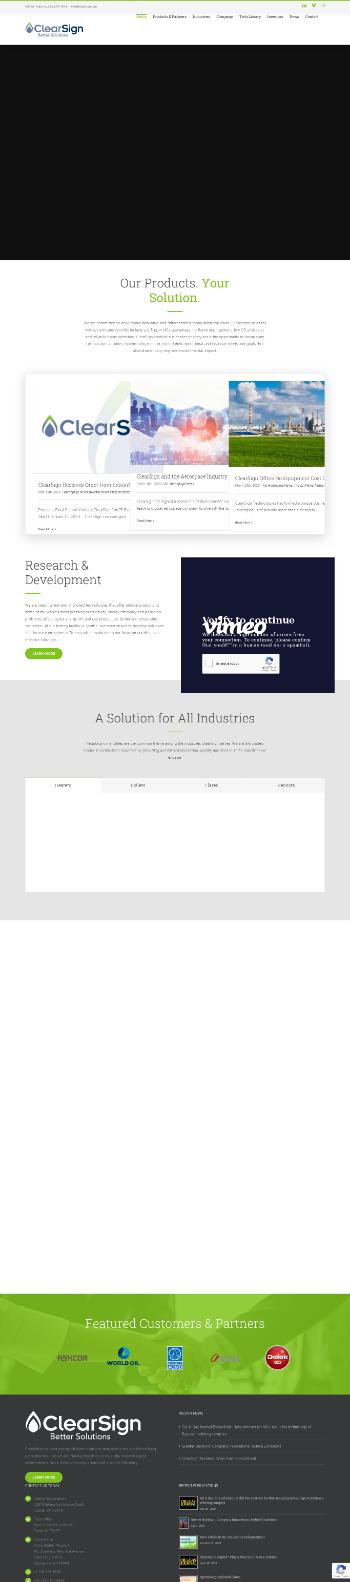 ClearSign Technologies Corporation Website Screenshot